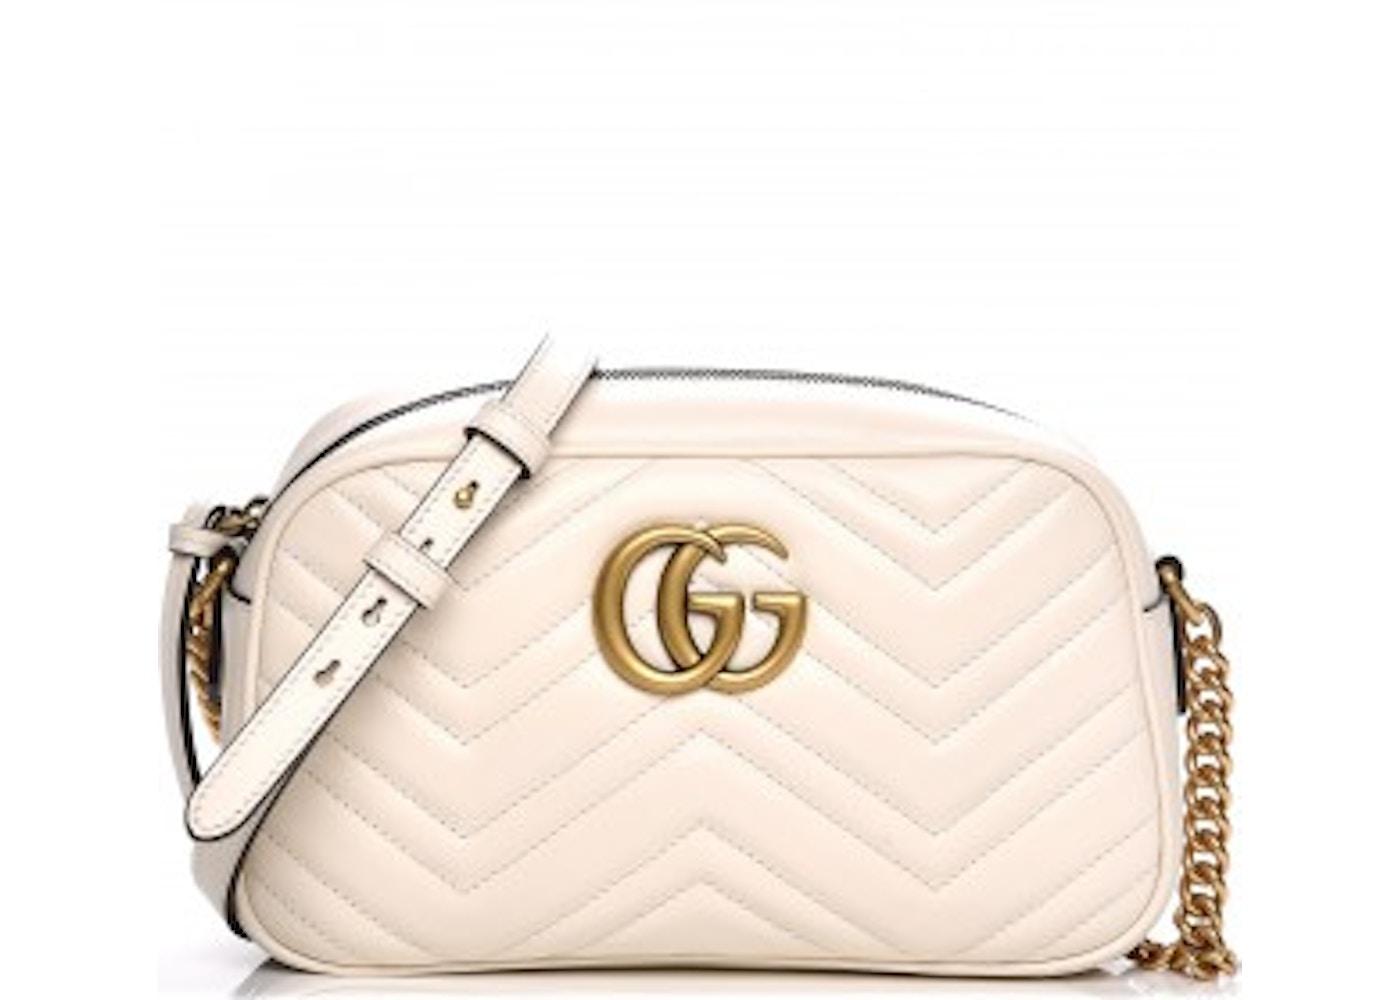 577dcca02cf6 Gucci Marmont Camera Bag Matelasse Small White